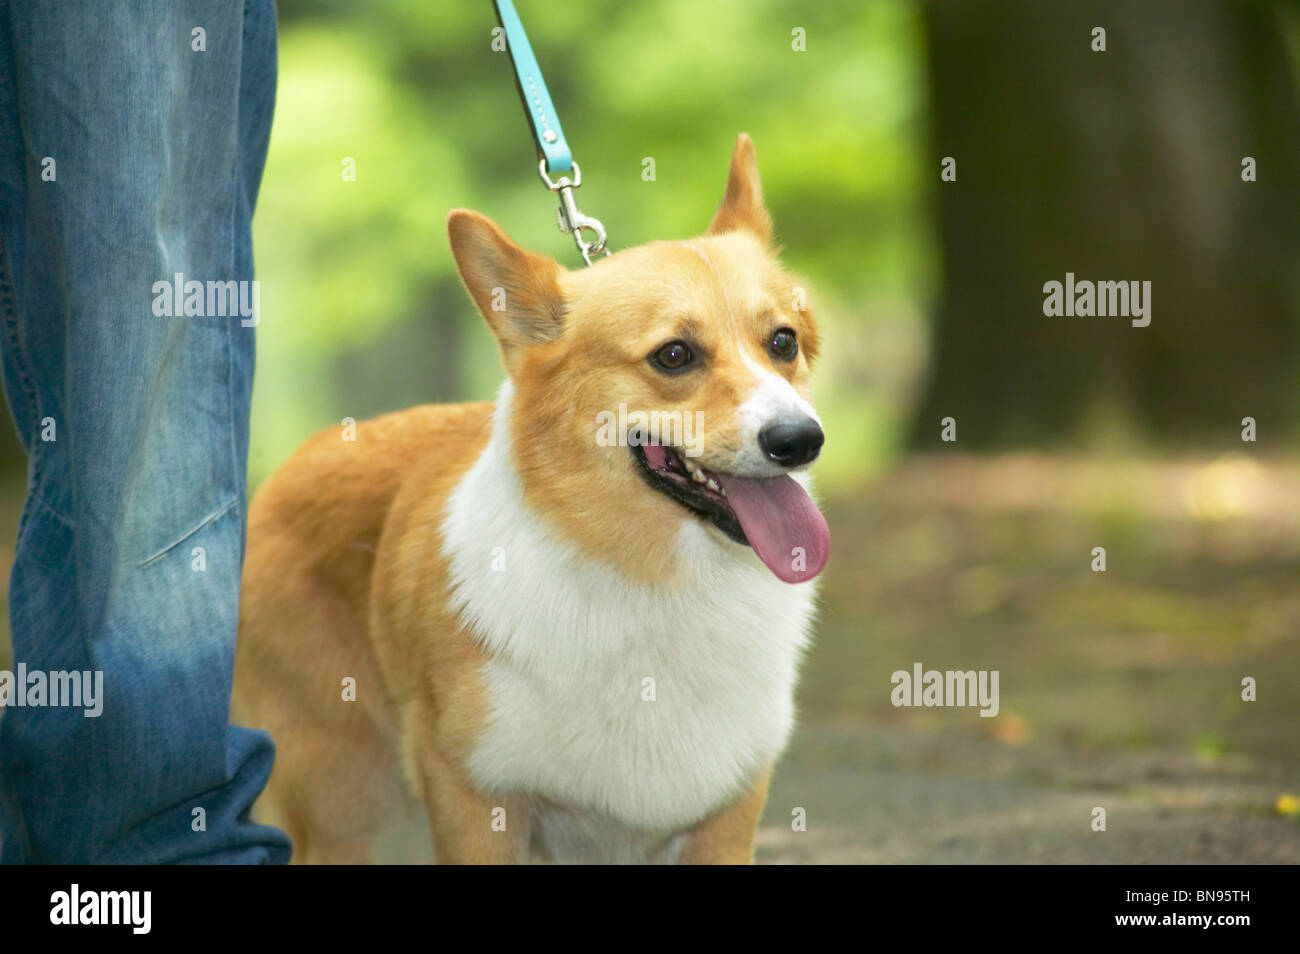 Corgi perro caminaba sobre una correa Foto de stock